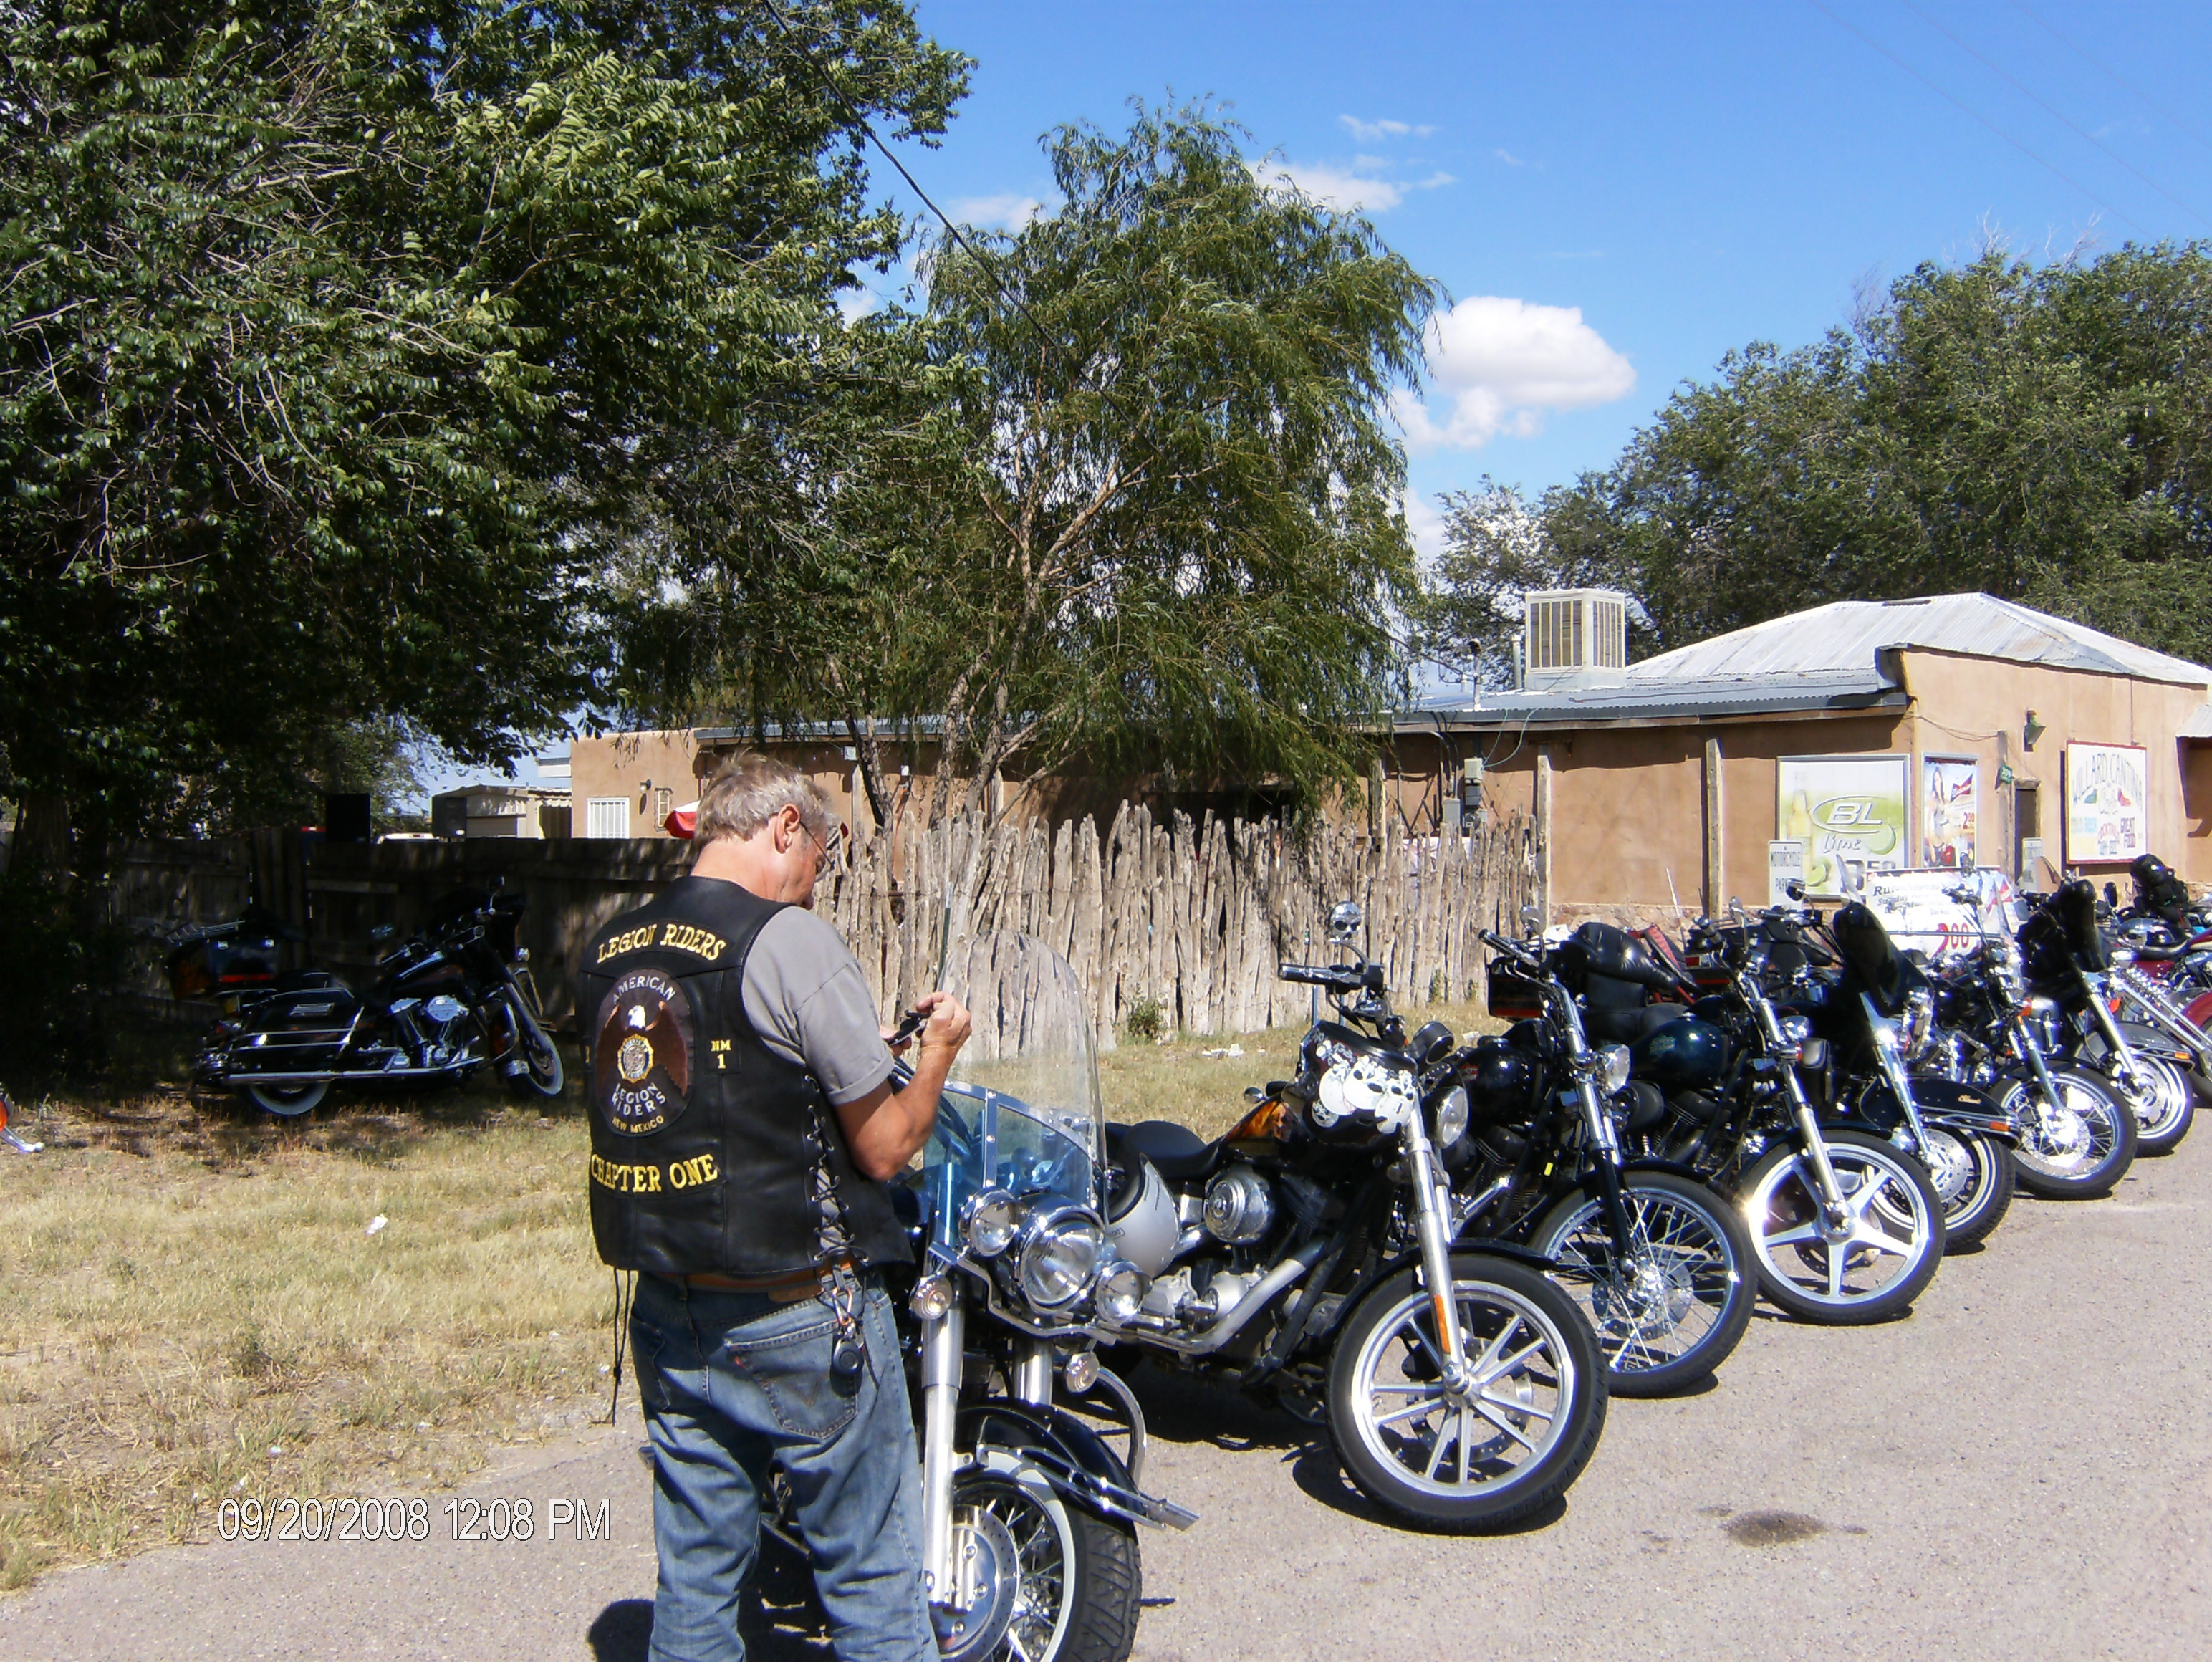 2008 Ruidoso and Willard Bike Ralley 029.jpg